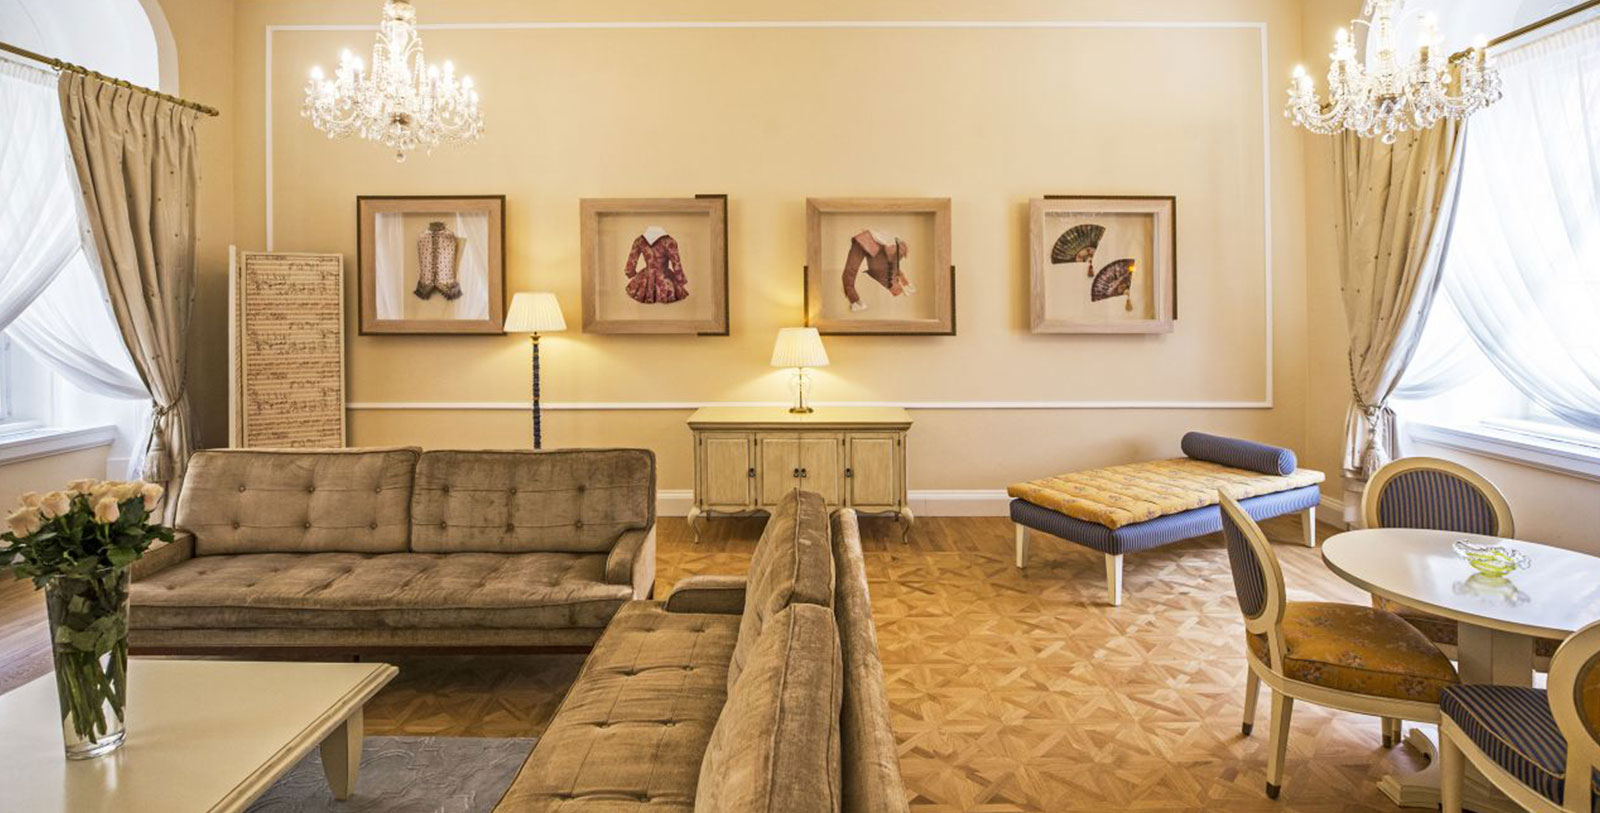 Image of Mozart Suite Living Room, The Mozart Prague, 1770, Member of Historic Hotels Worldwide, Prague, Czech Republic, Hot Deals